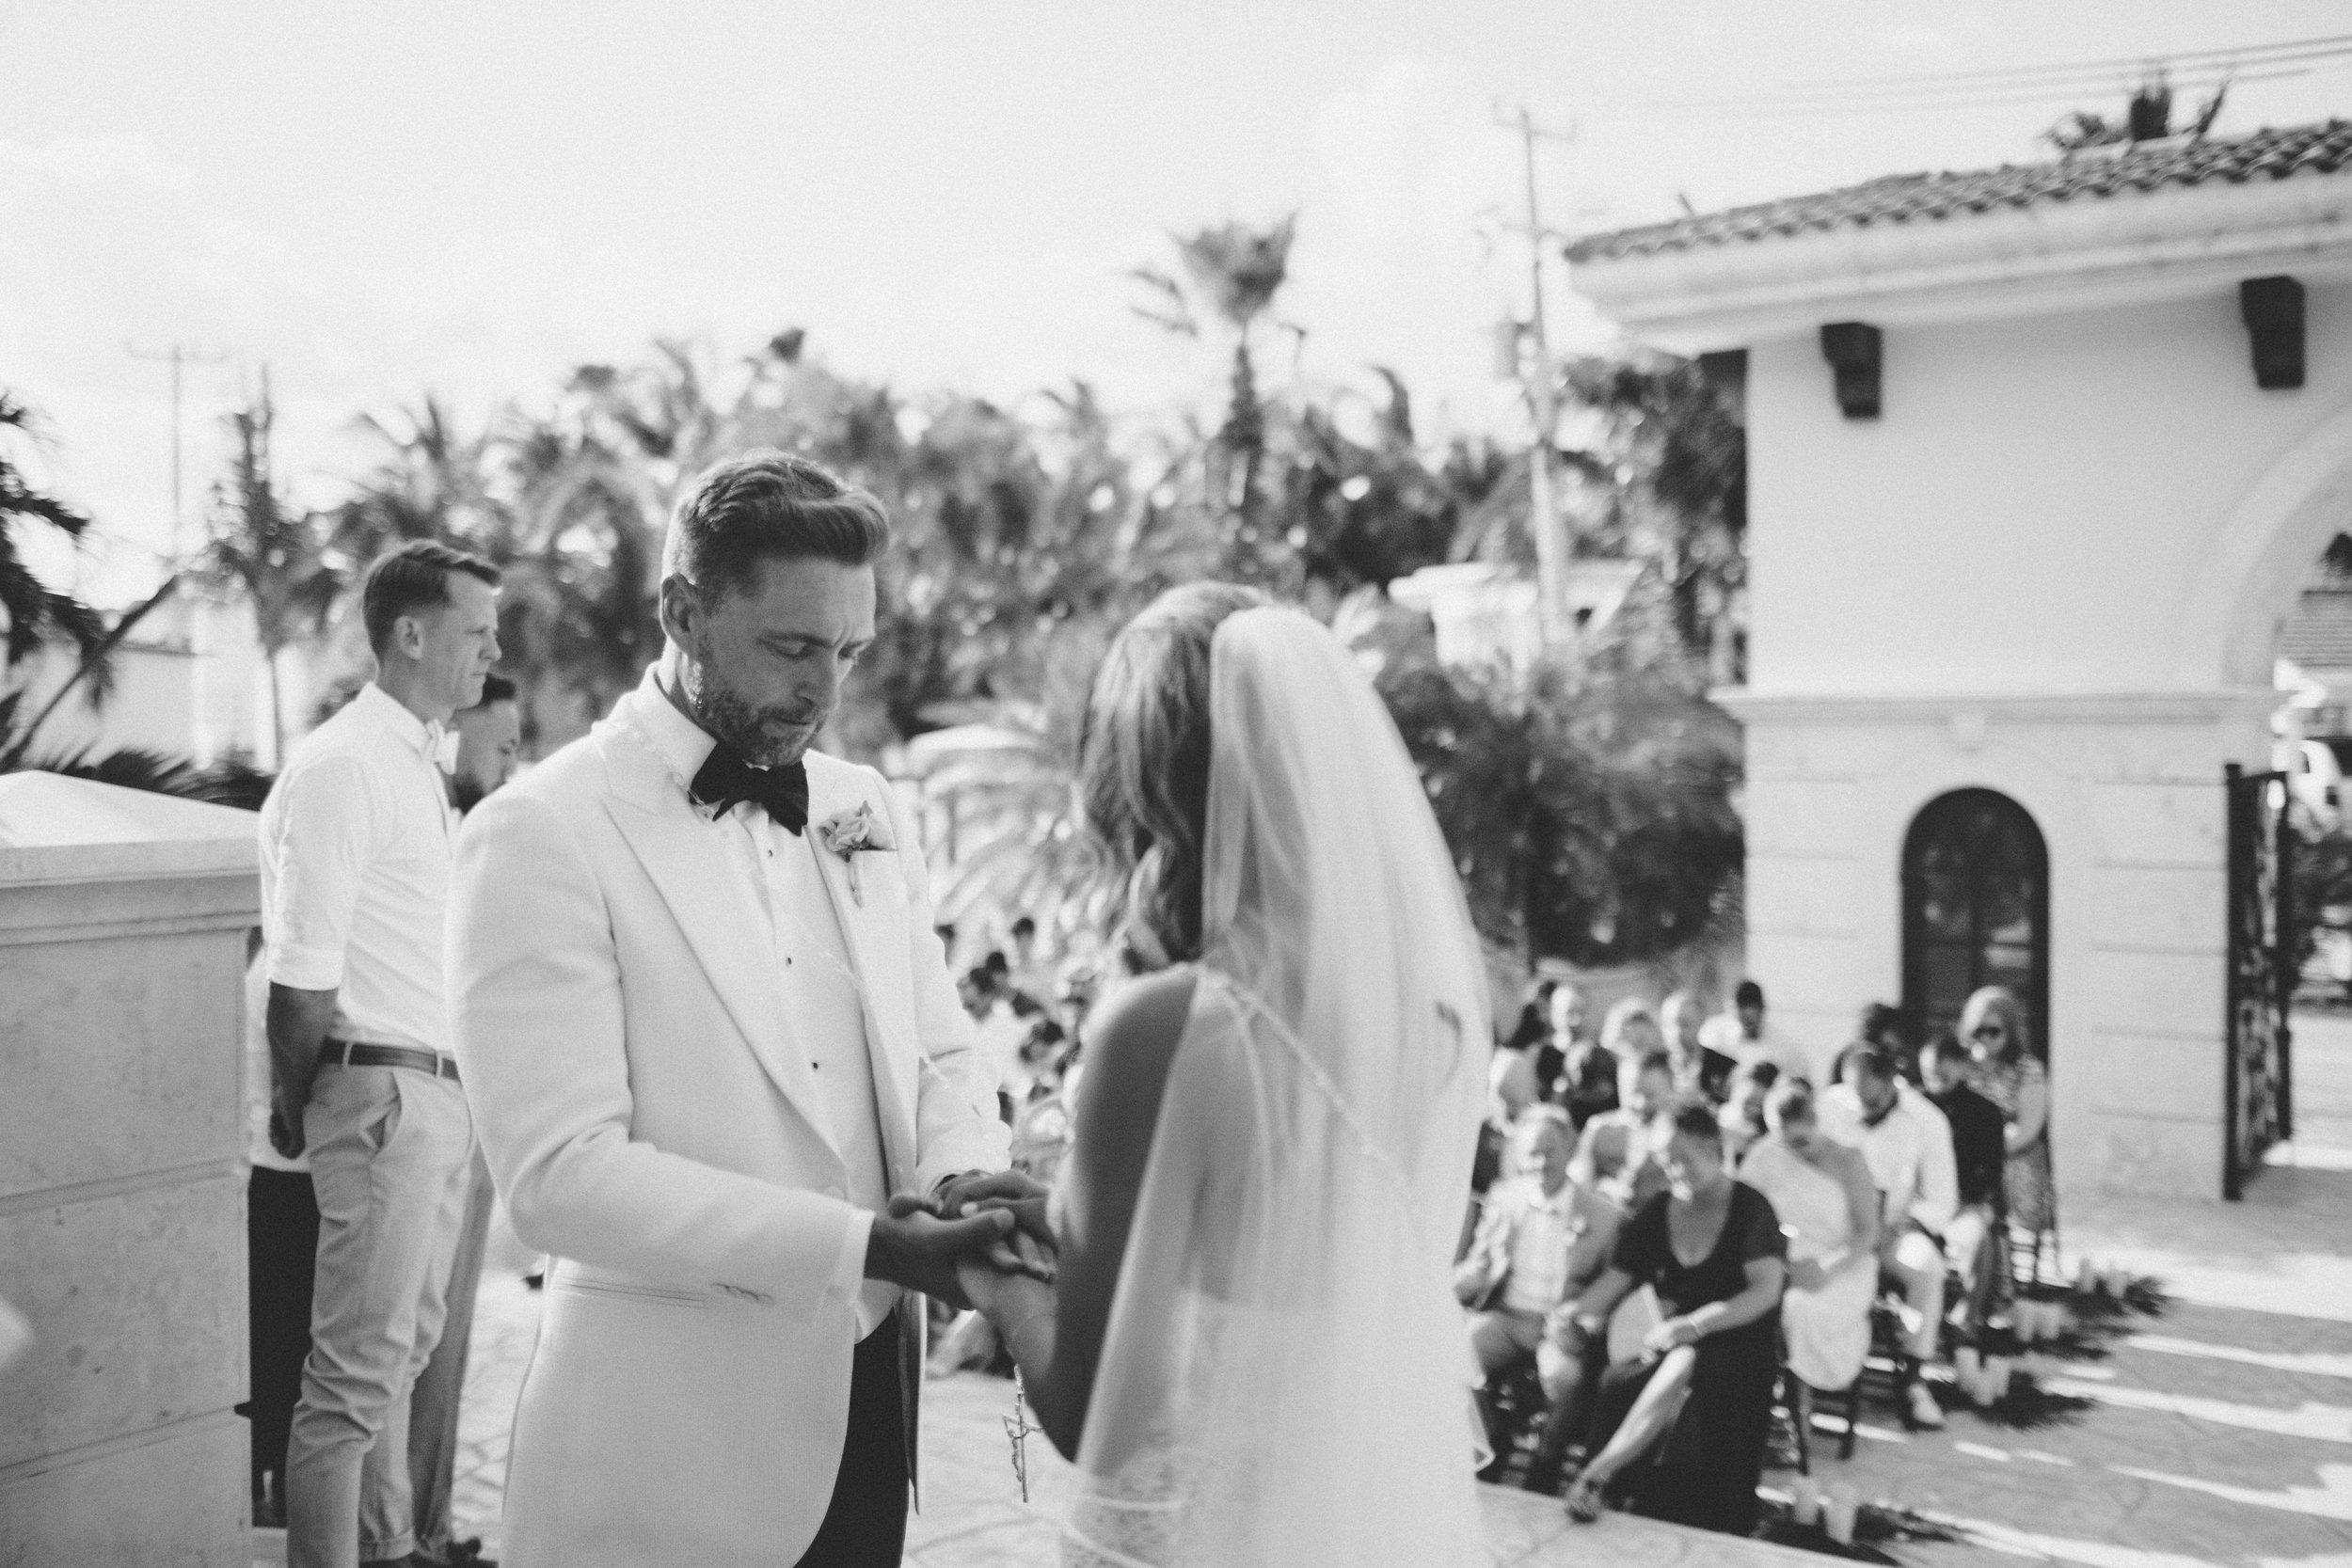 mexico_wedding_cancun_villa_la_joya_evangeline_lane_062.jpg